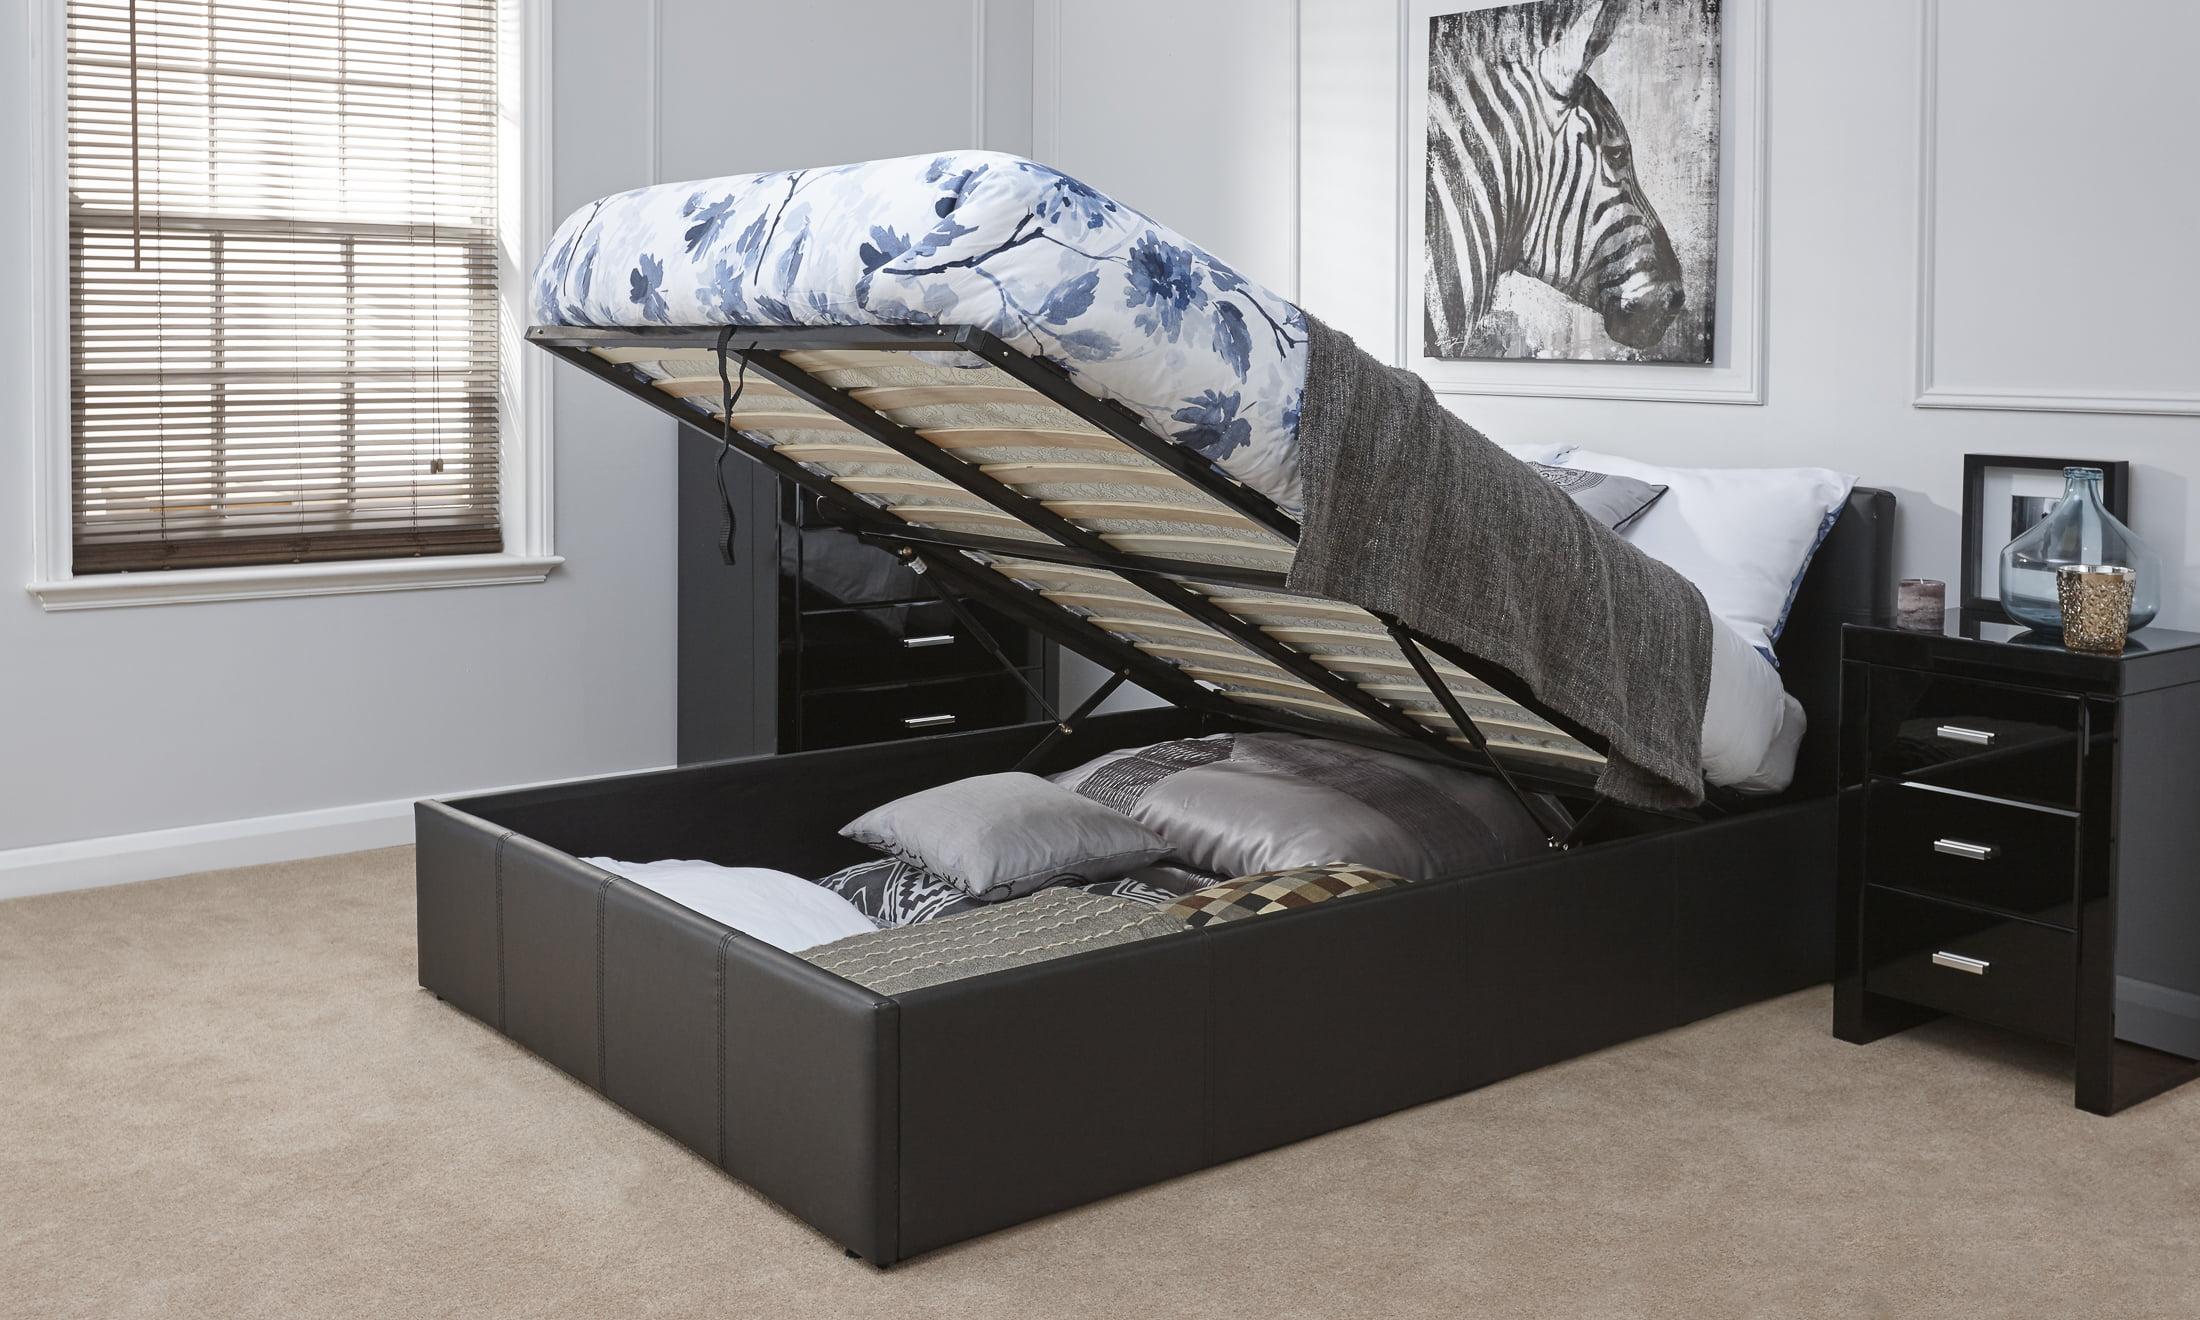 Arizona Black Leather Ottoman Bed Frame - Dublin Beds